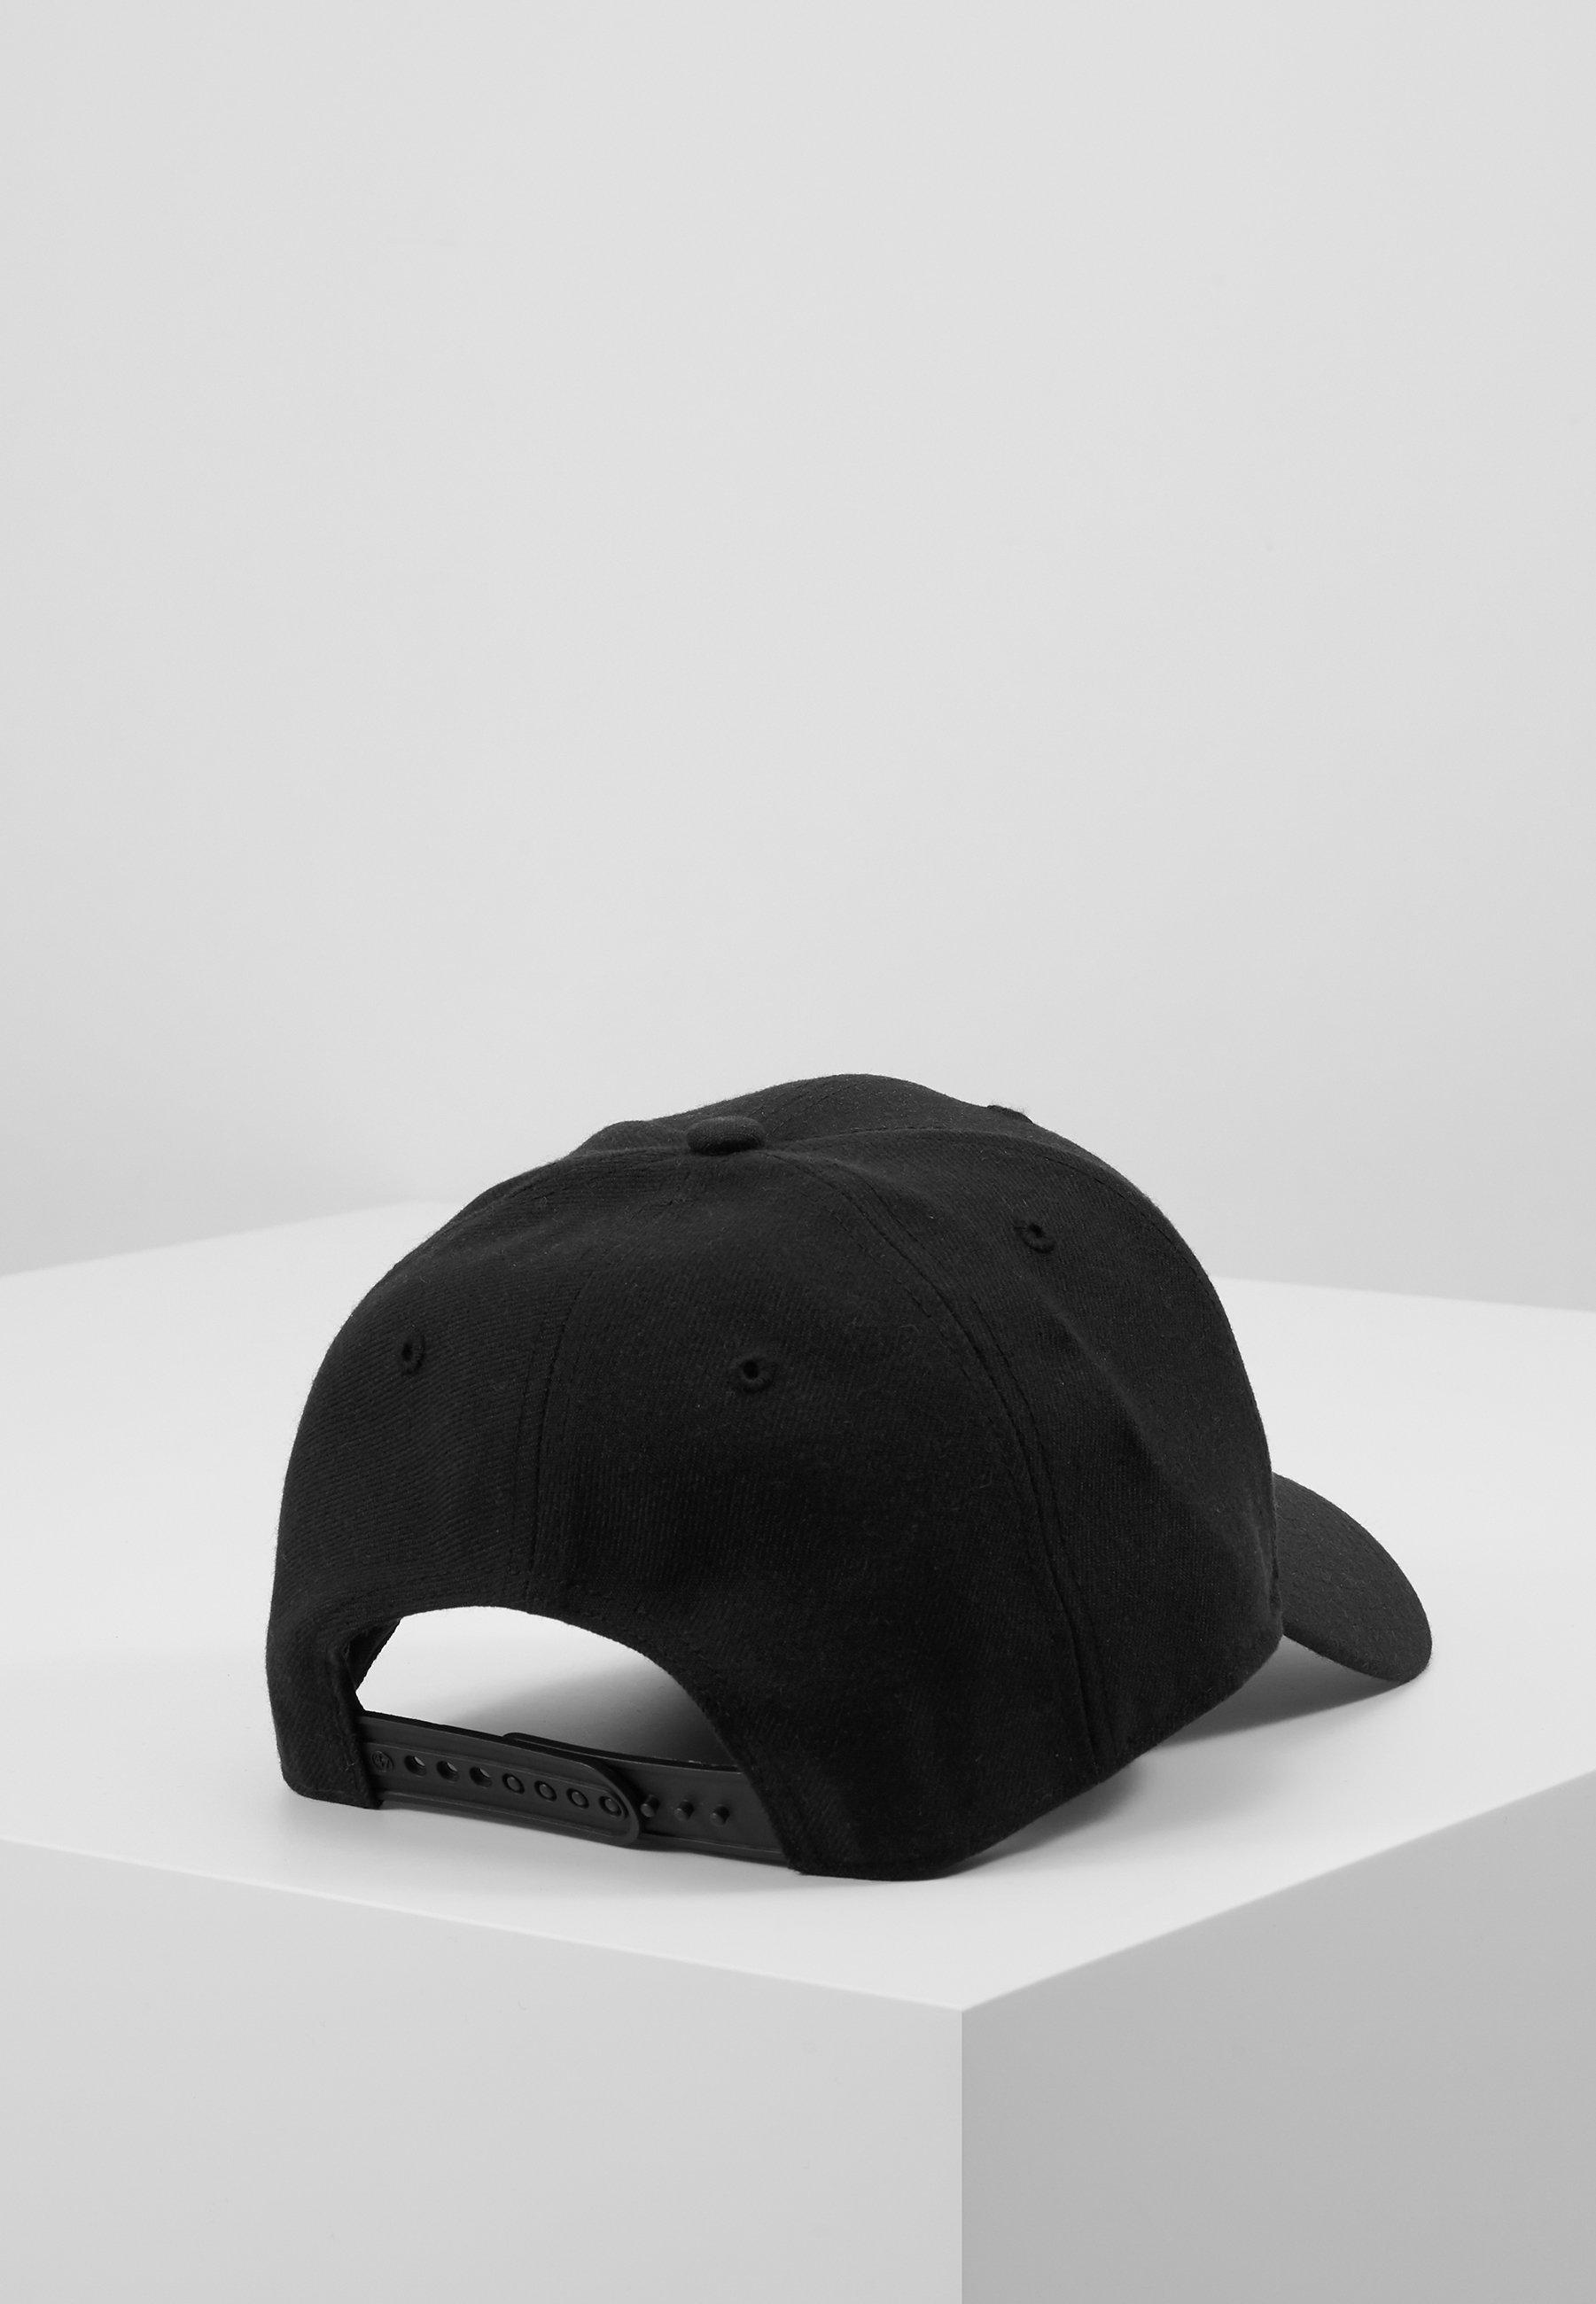 '47 LOS ANGELES DODGERS SNAPBACK - Cap - black/svart bUWBINnZEEm8ReR